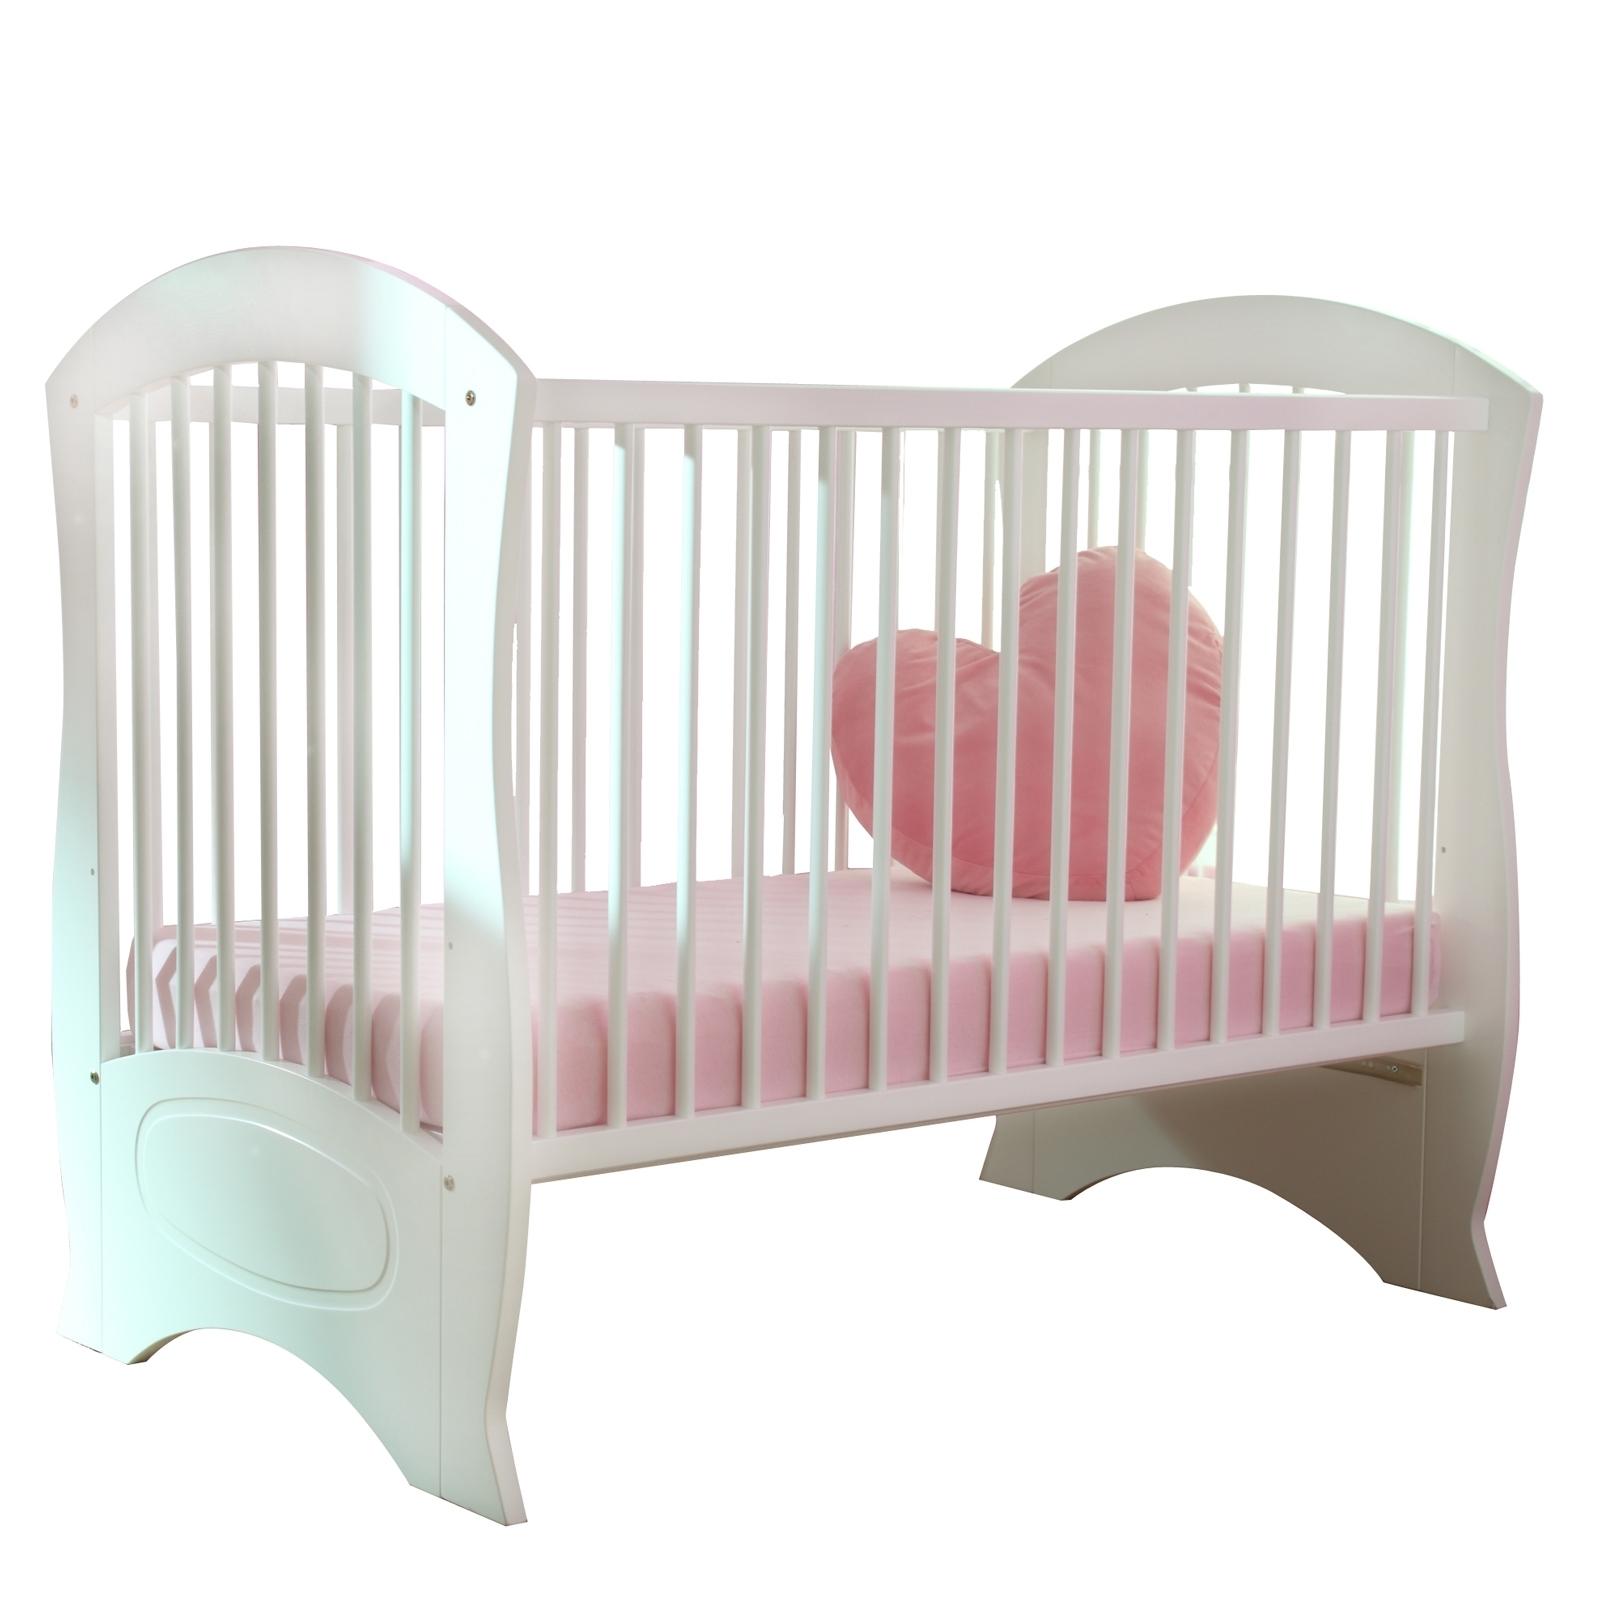 lit barreaux blanc perle 60. Black Bedroom Furniture Sets. Home Design Ideas